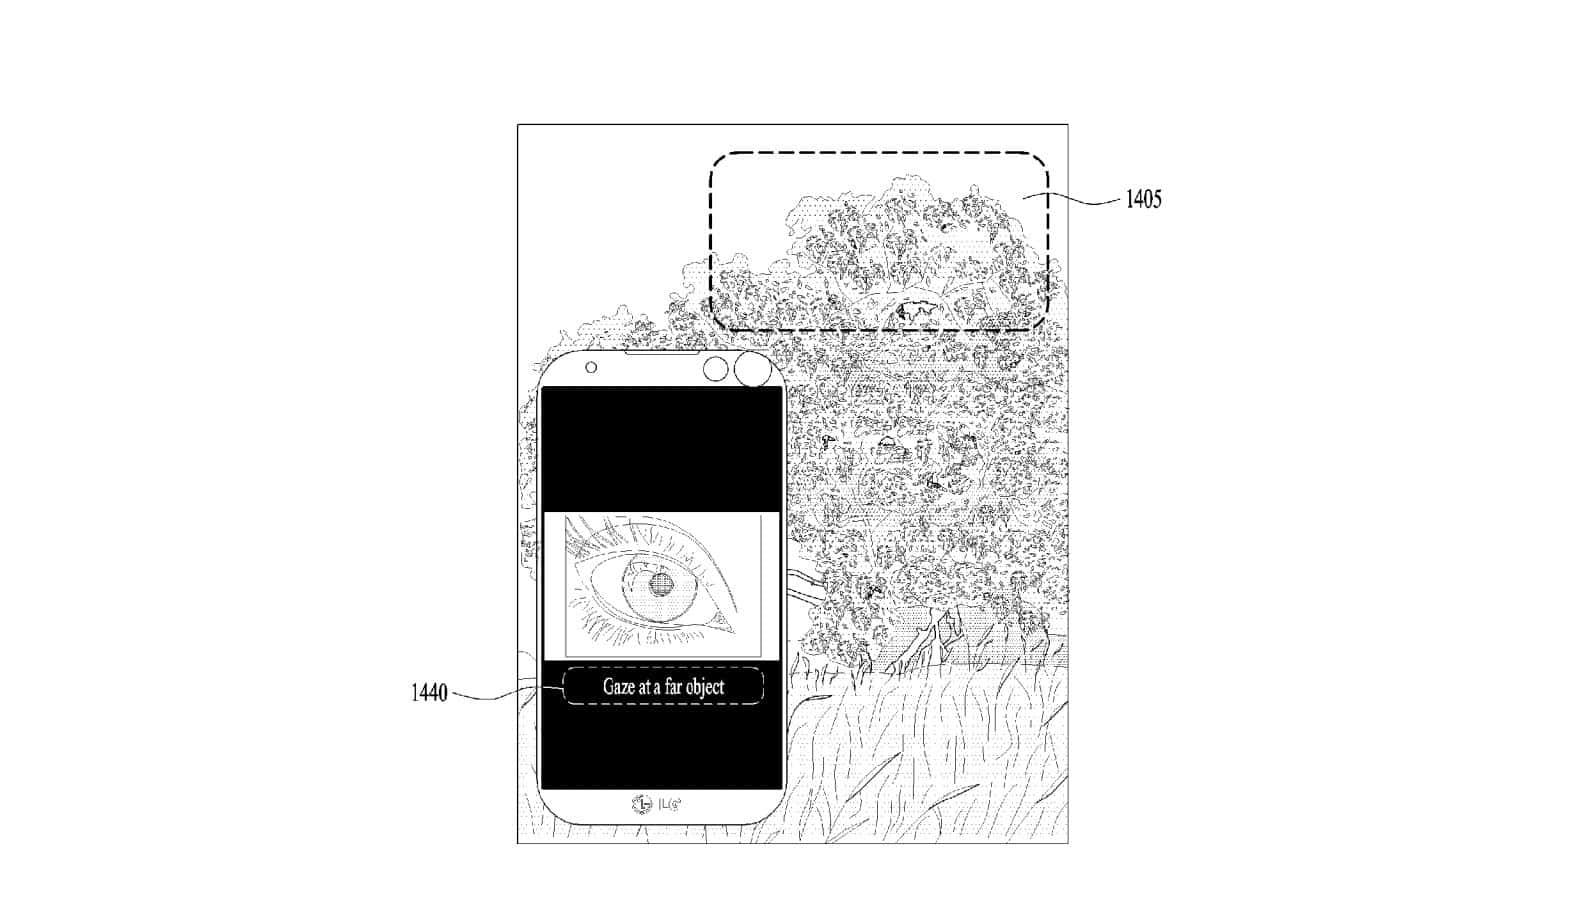 LG Iris WIPO Patent 11